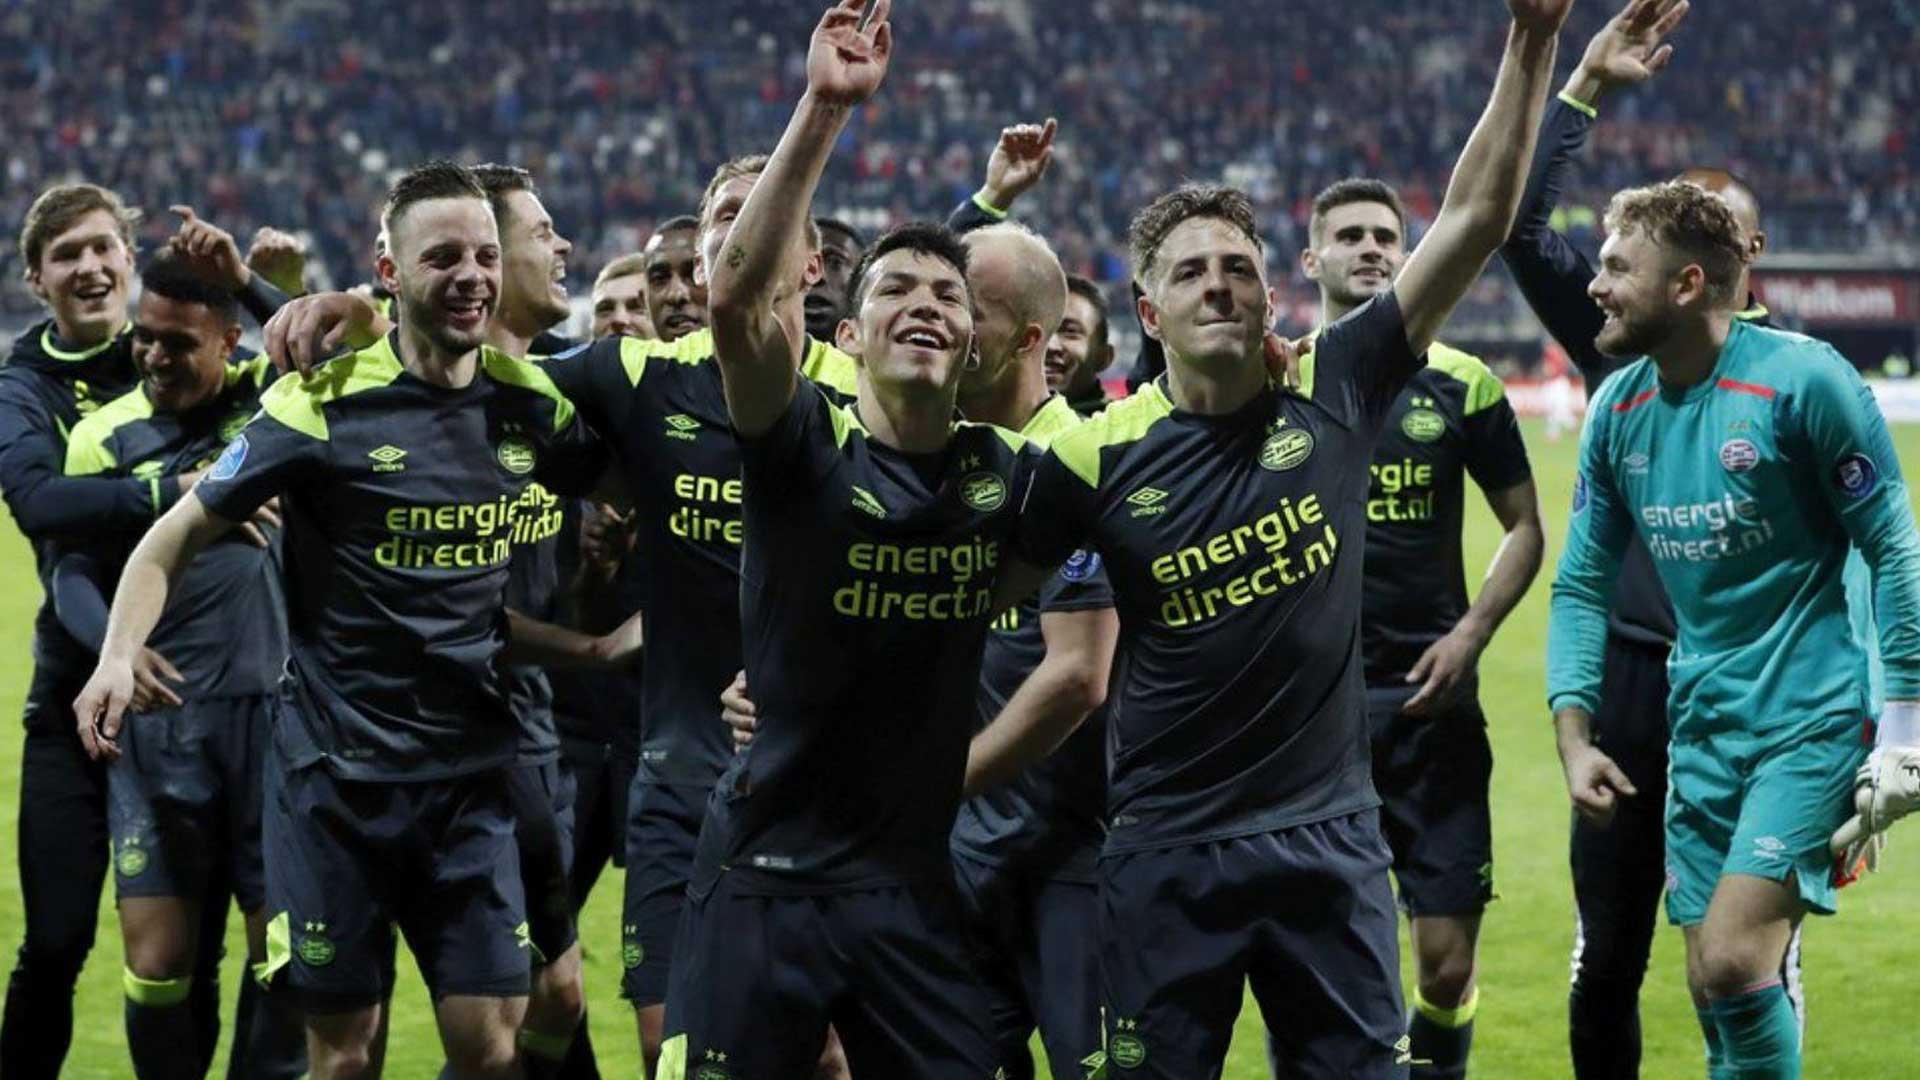 Zonnevijlle PSV #roadto24